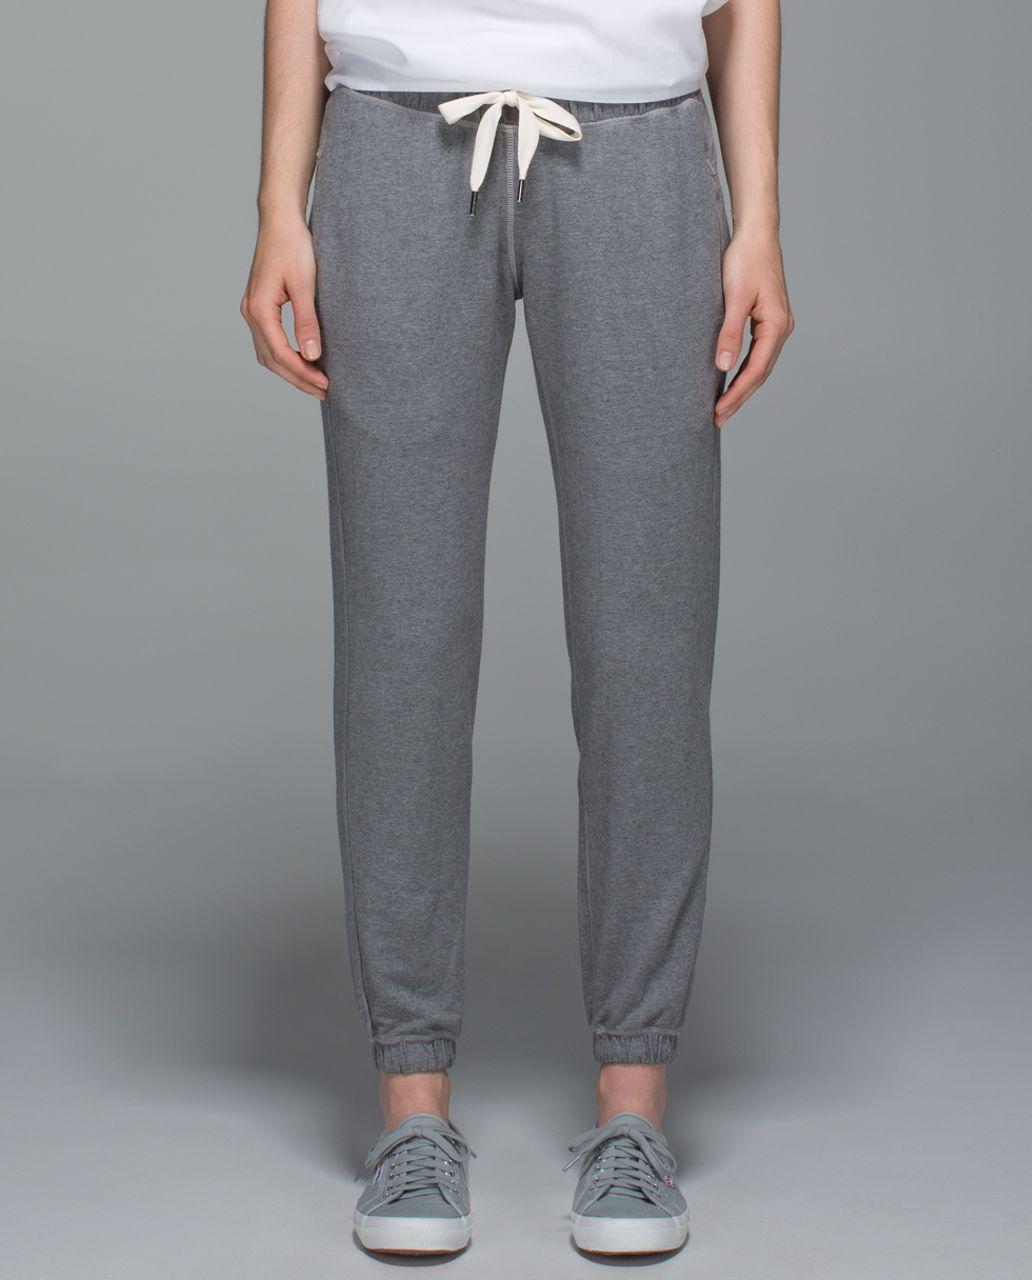 a679763f58 Lululemon Serenity Pant - Heathered Mod Medium Grey - lulu fanatics